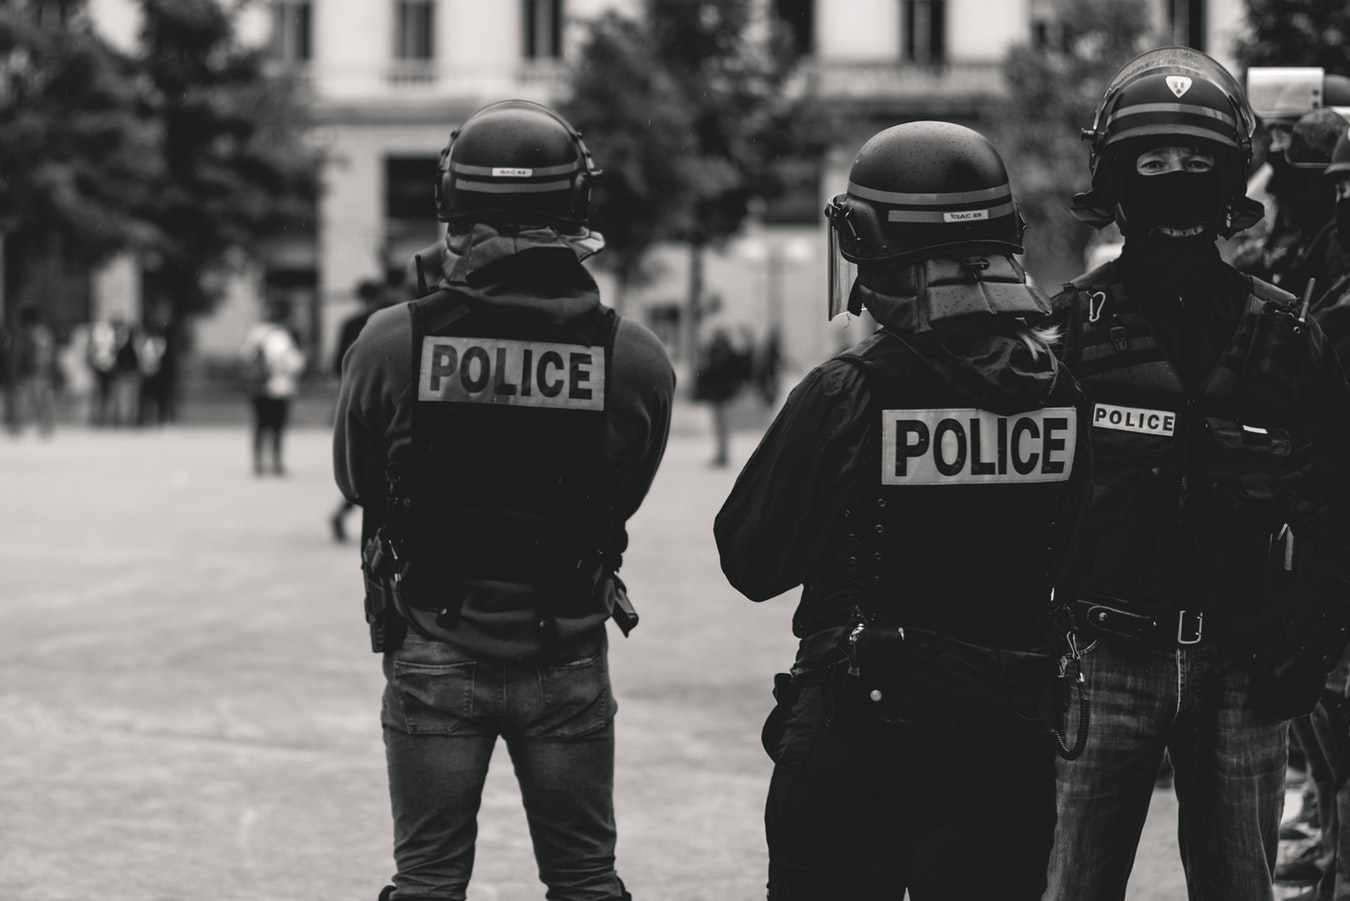 National Police Accountability Project (NPAP)